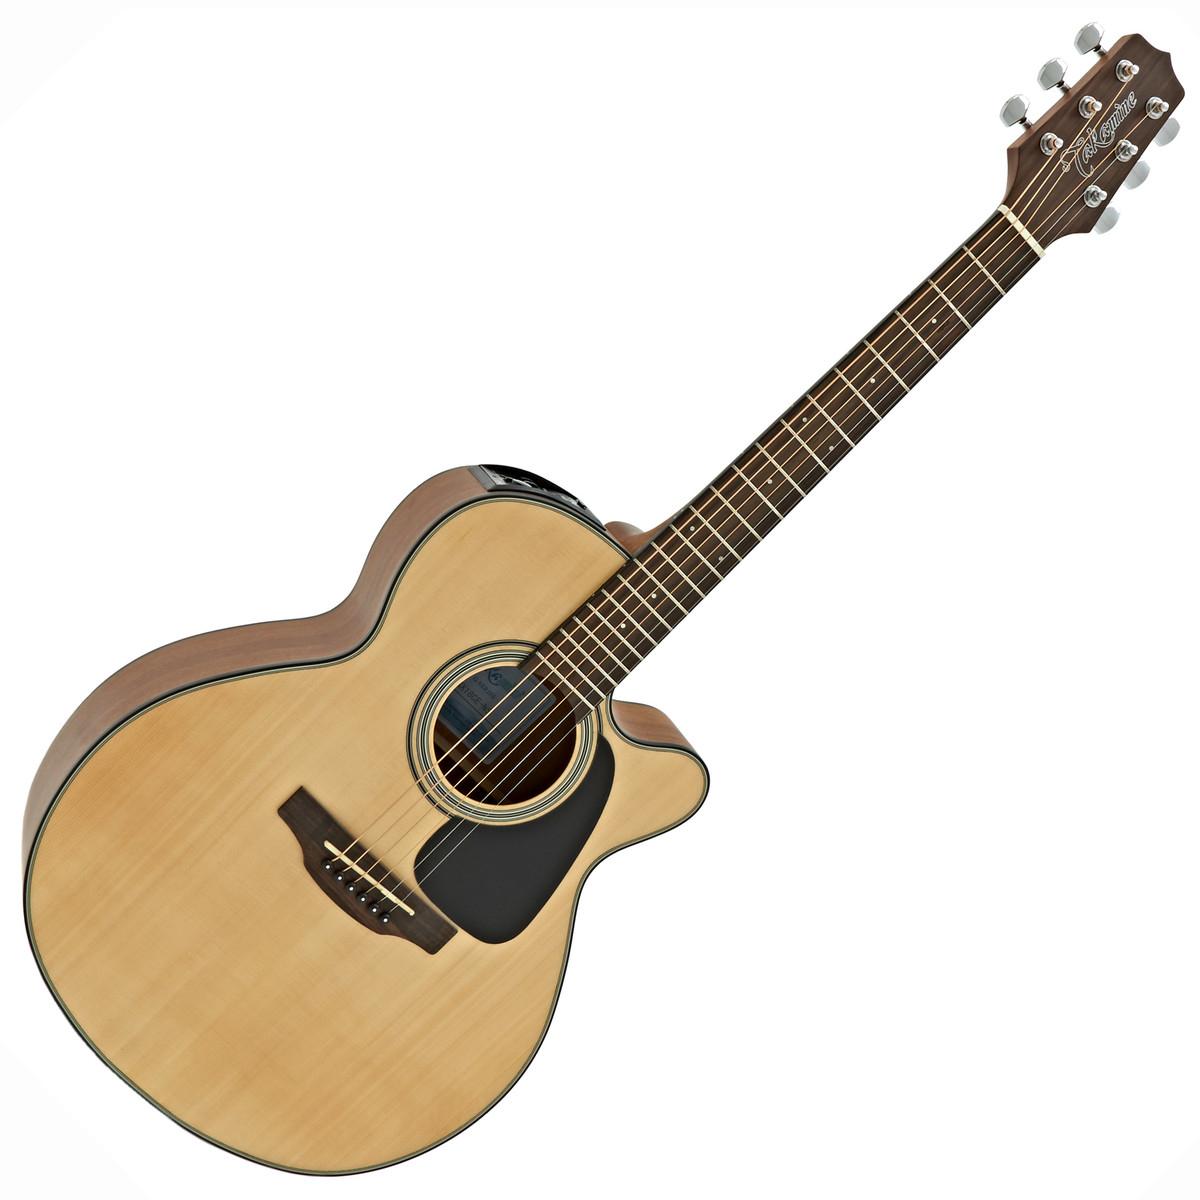 GX18CE Taka-Mini Electro Acoustic Guitar Natural: Acoustic Guitar